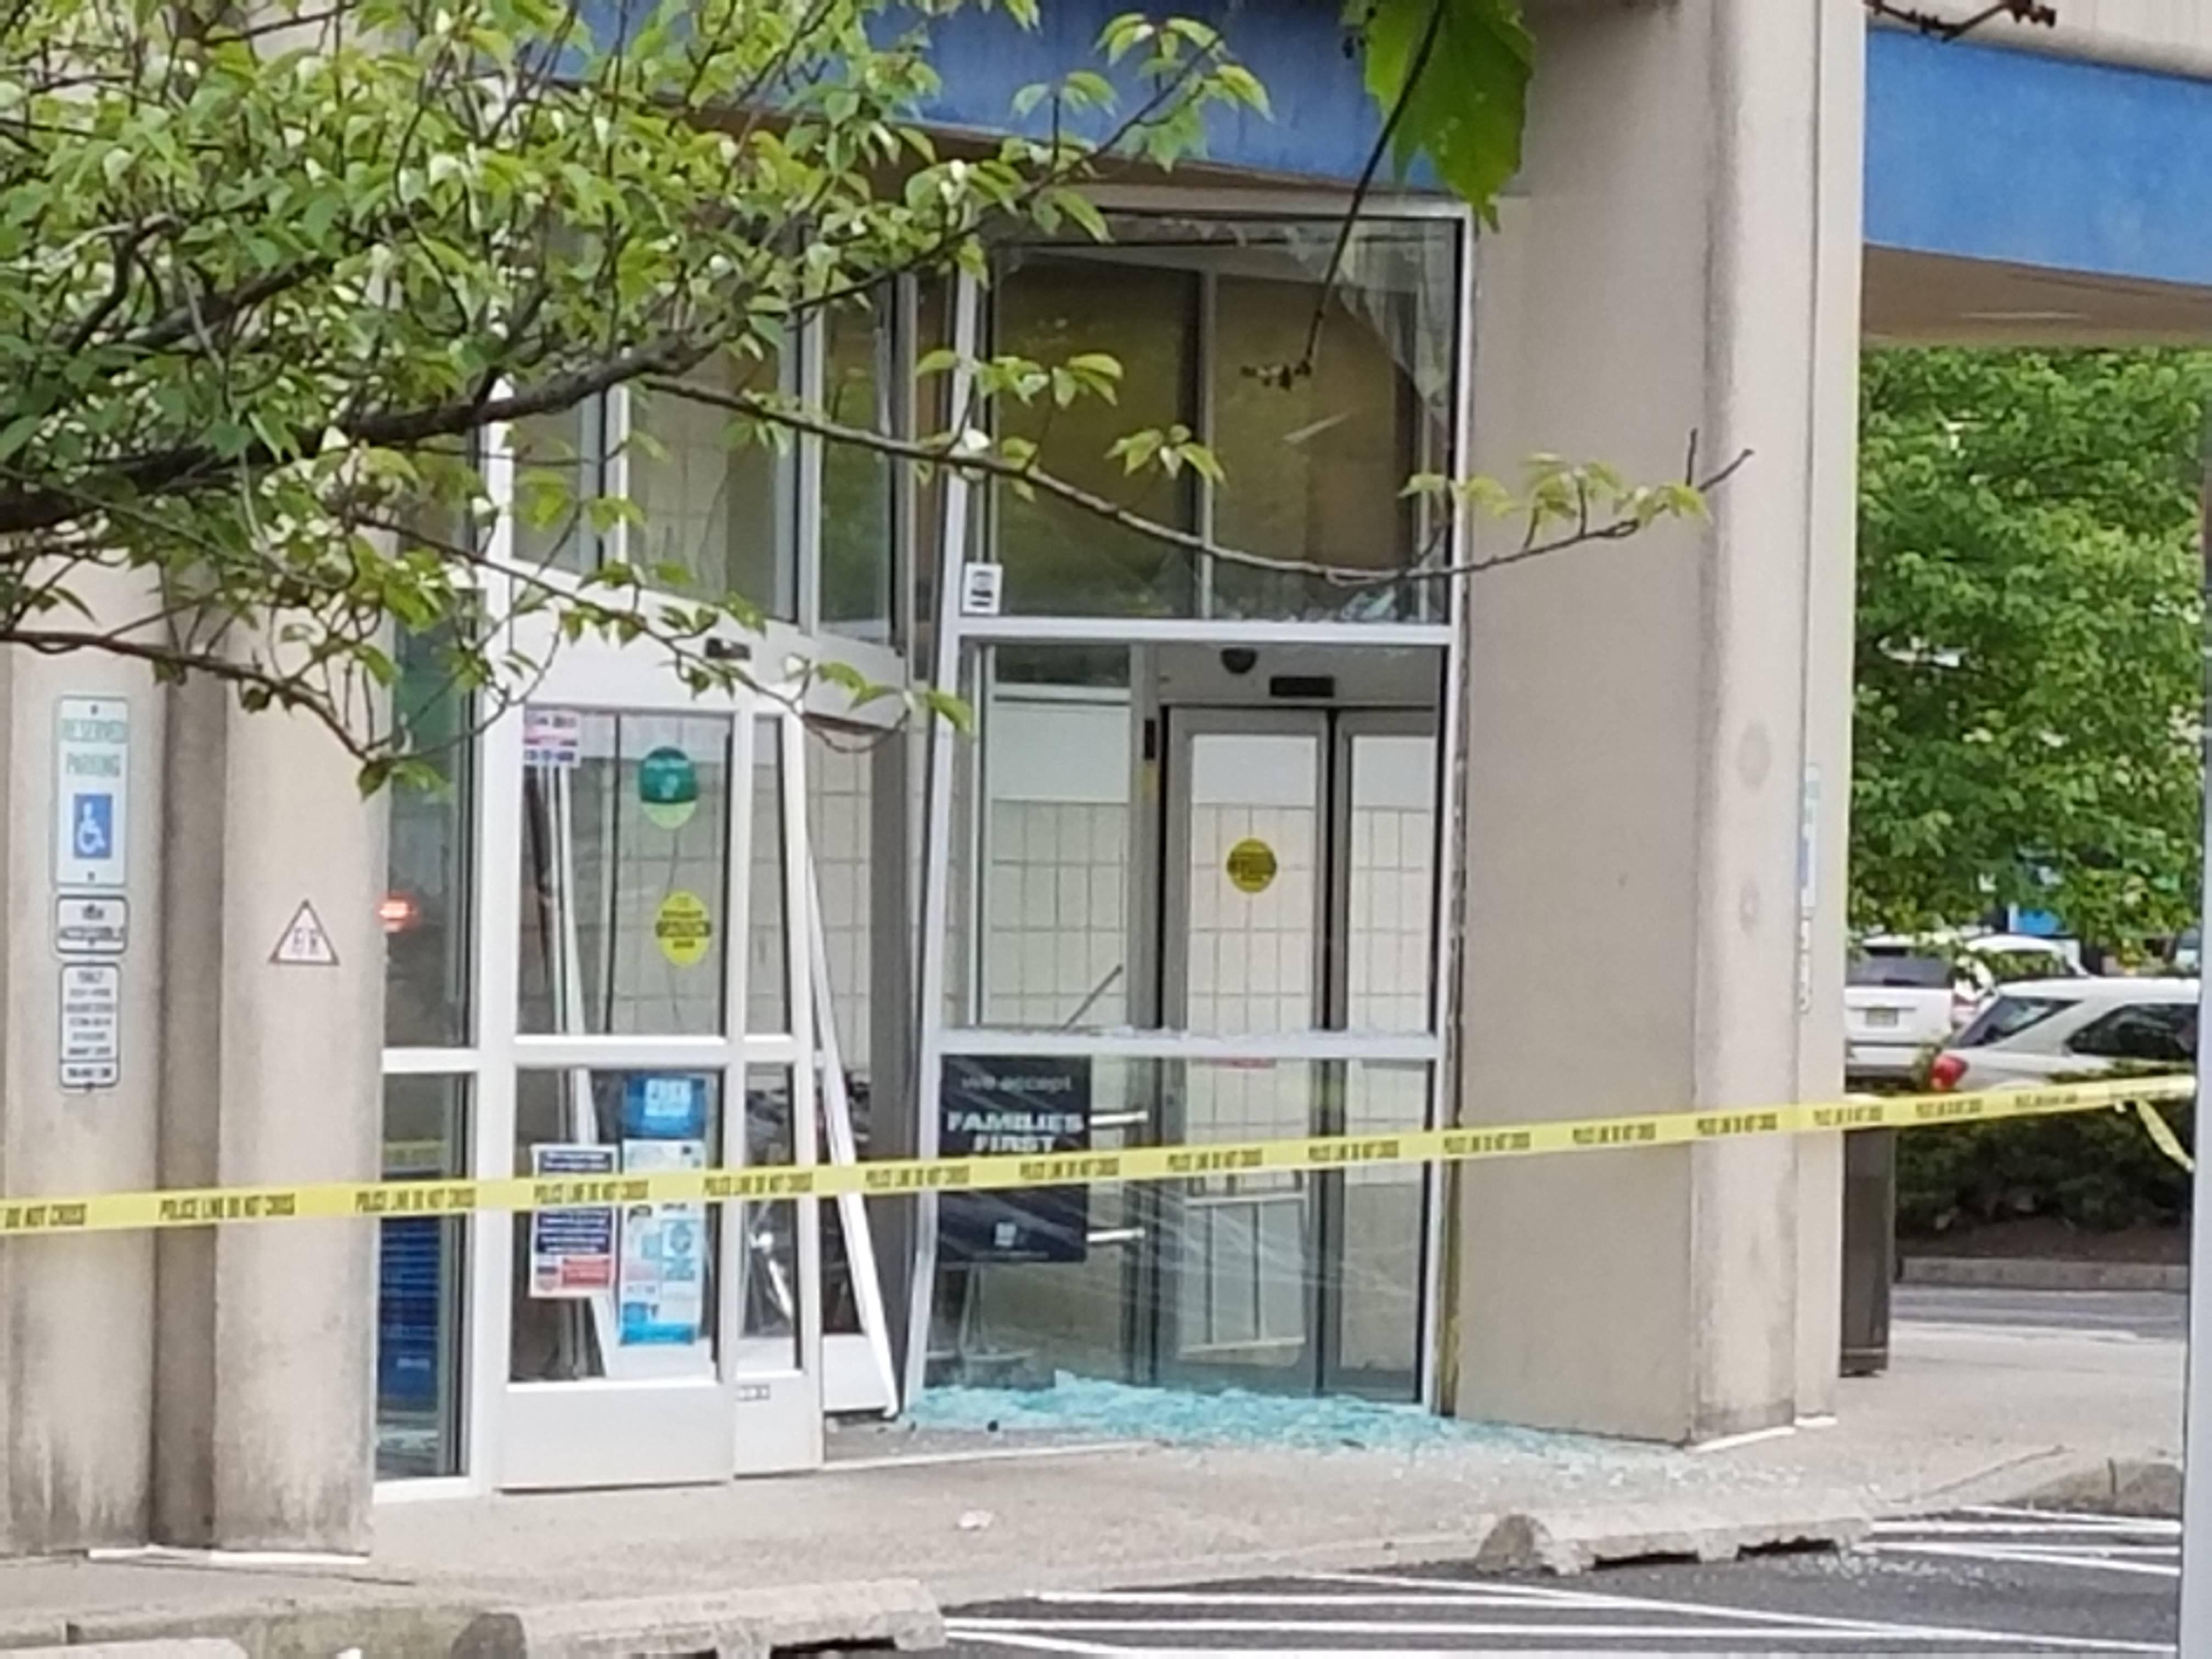 Minor Injuries As Car Slams Into Rite Aid Entrance